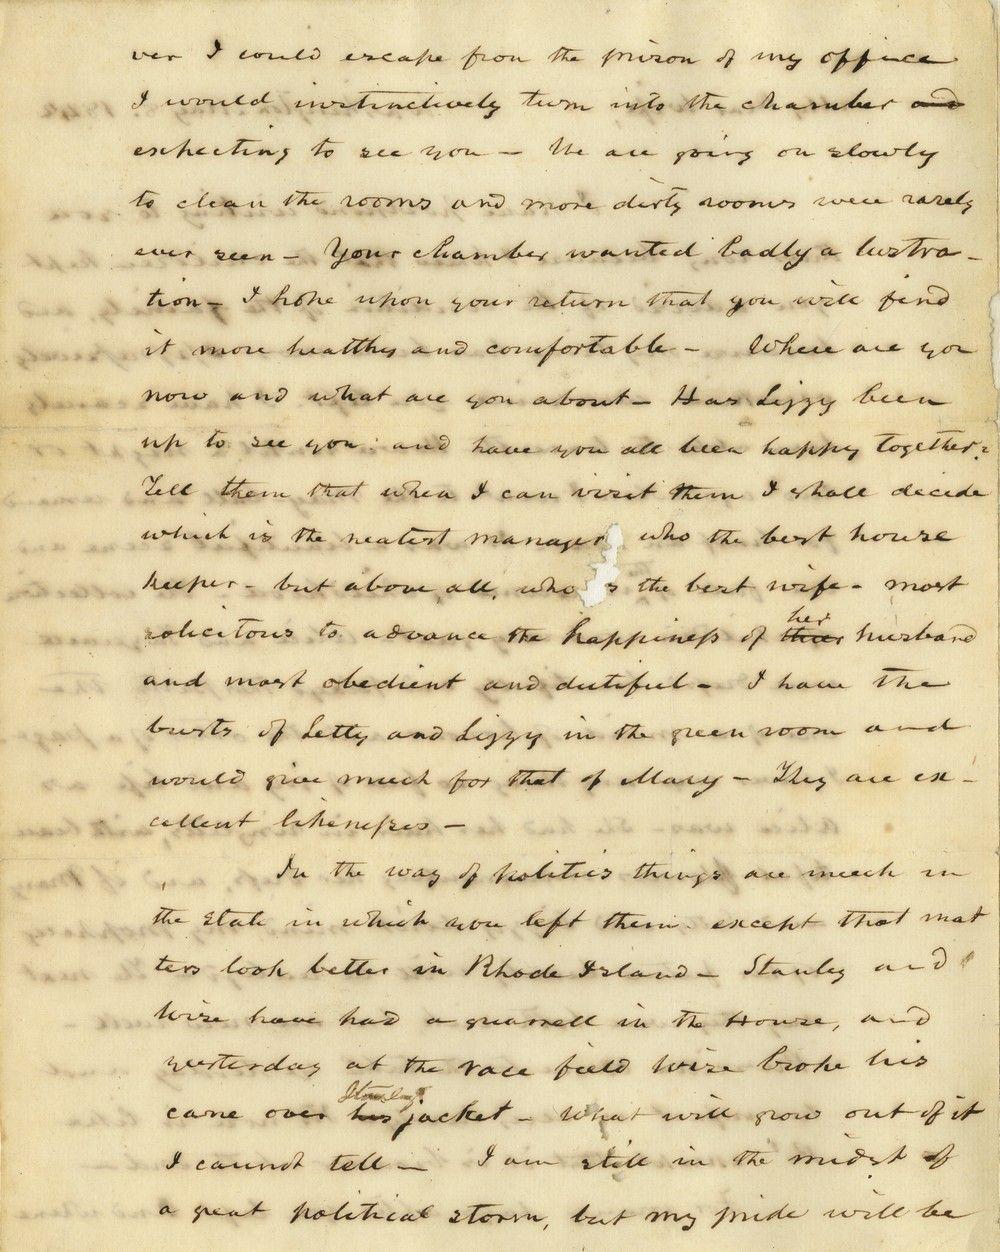 Page 2 transcript